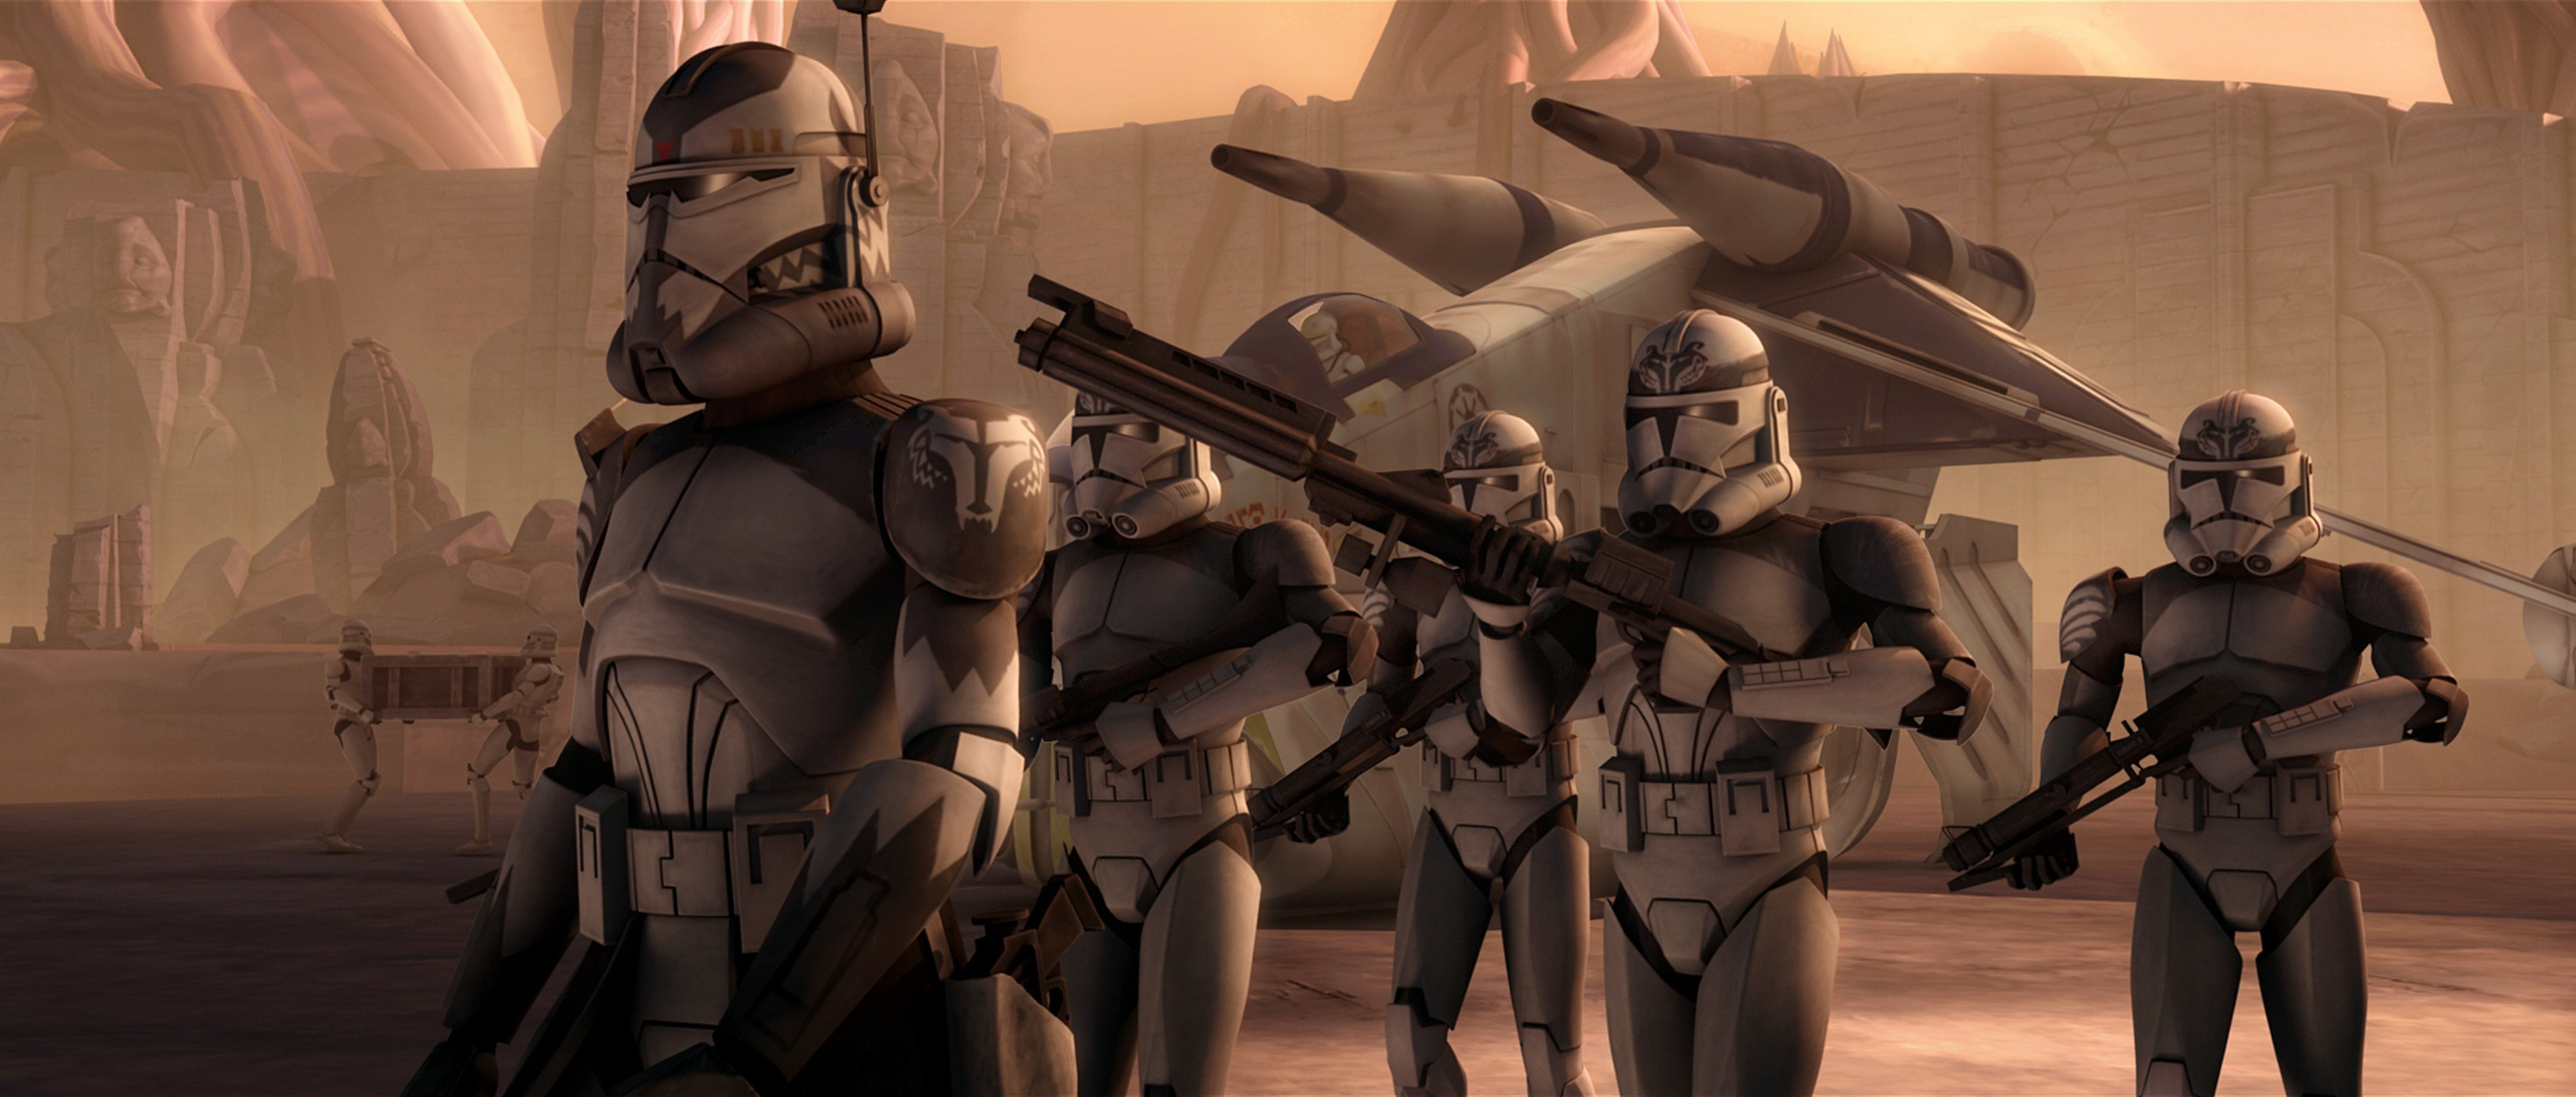 Star Wars, Clone Trooper Wallpapers HD / Desktop and Mobile .